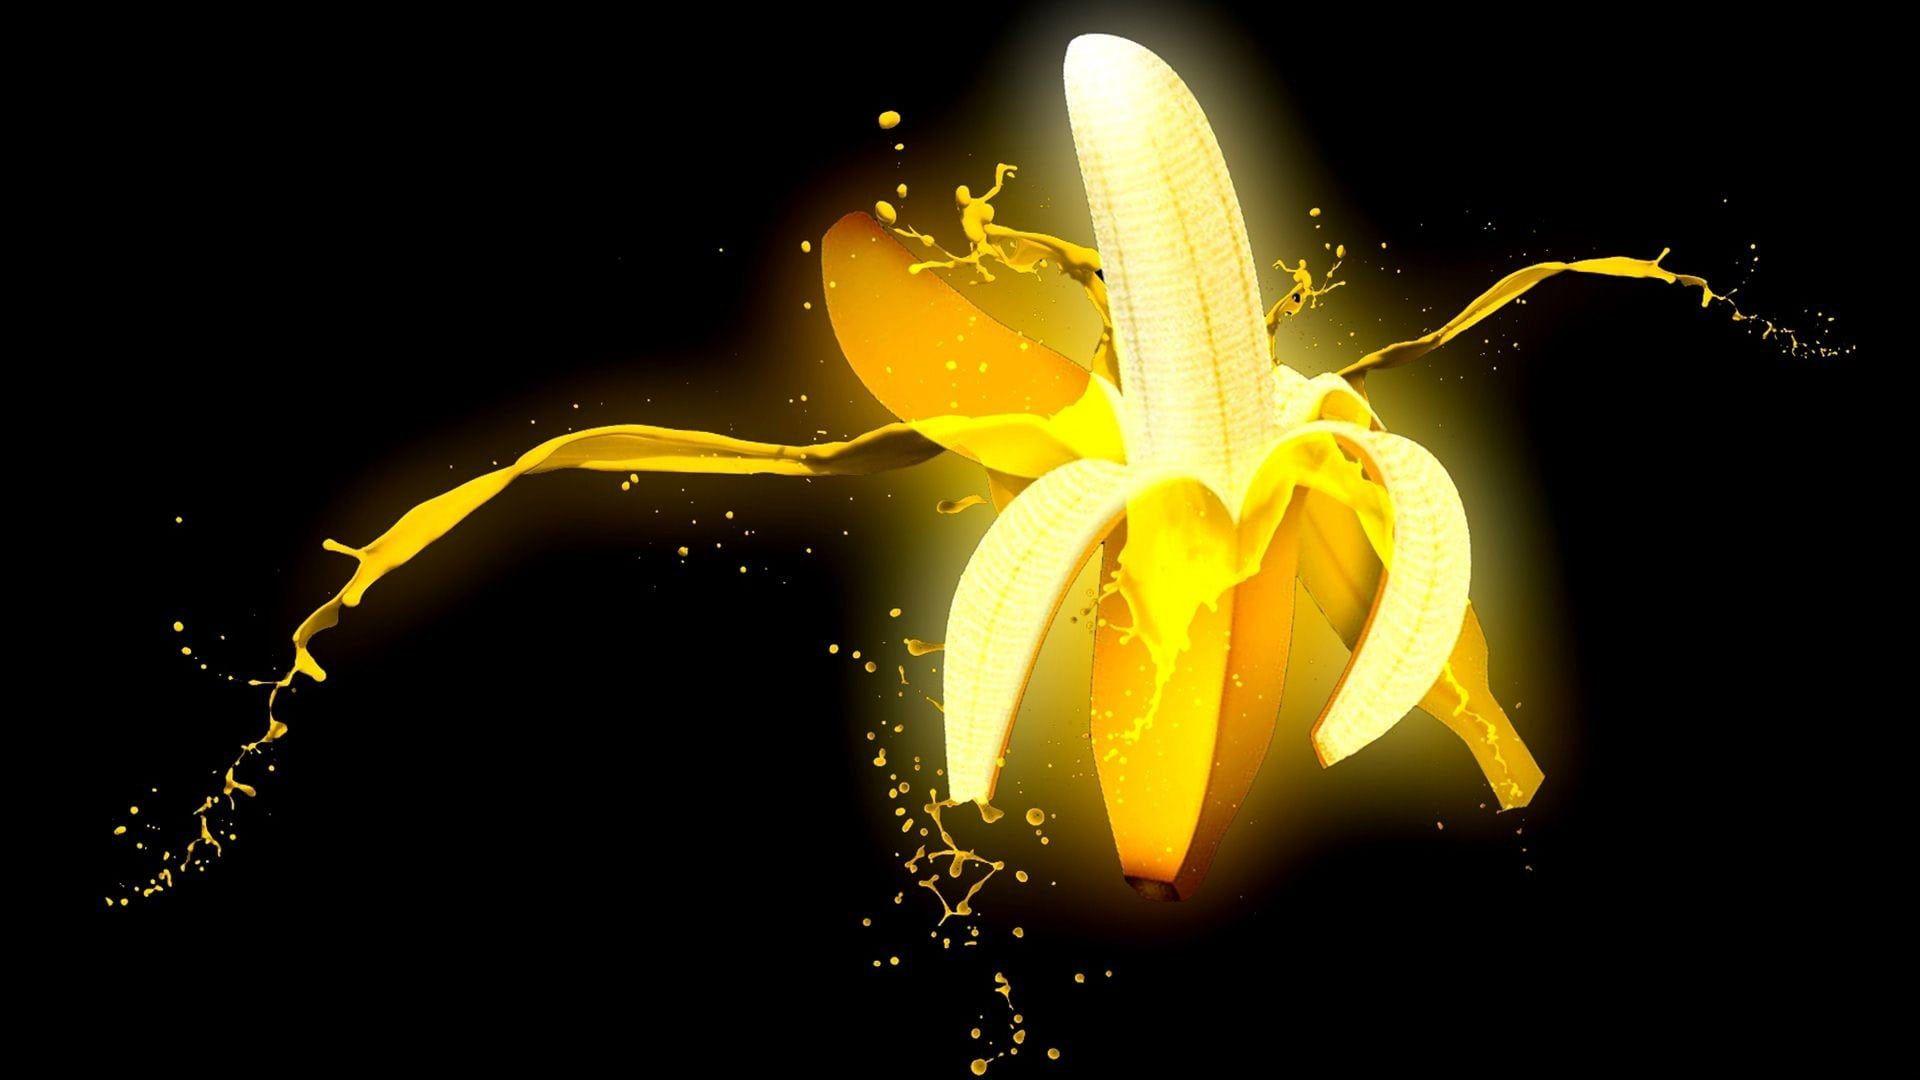 Banana HD Images 1 Whb BananaHDImages Fruit Wallpapers Hdwallpapers